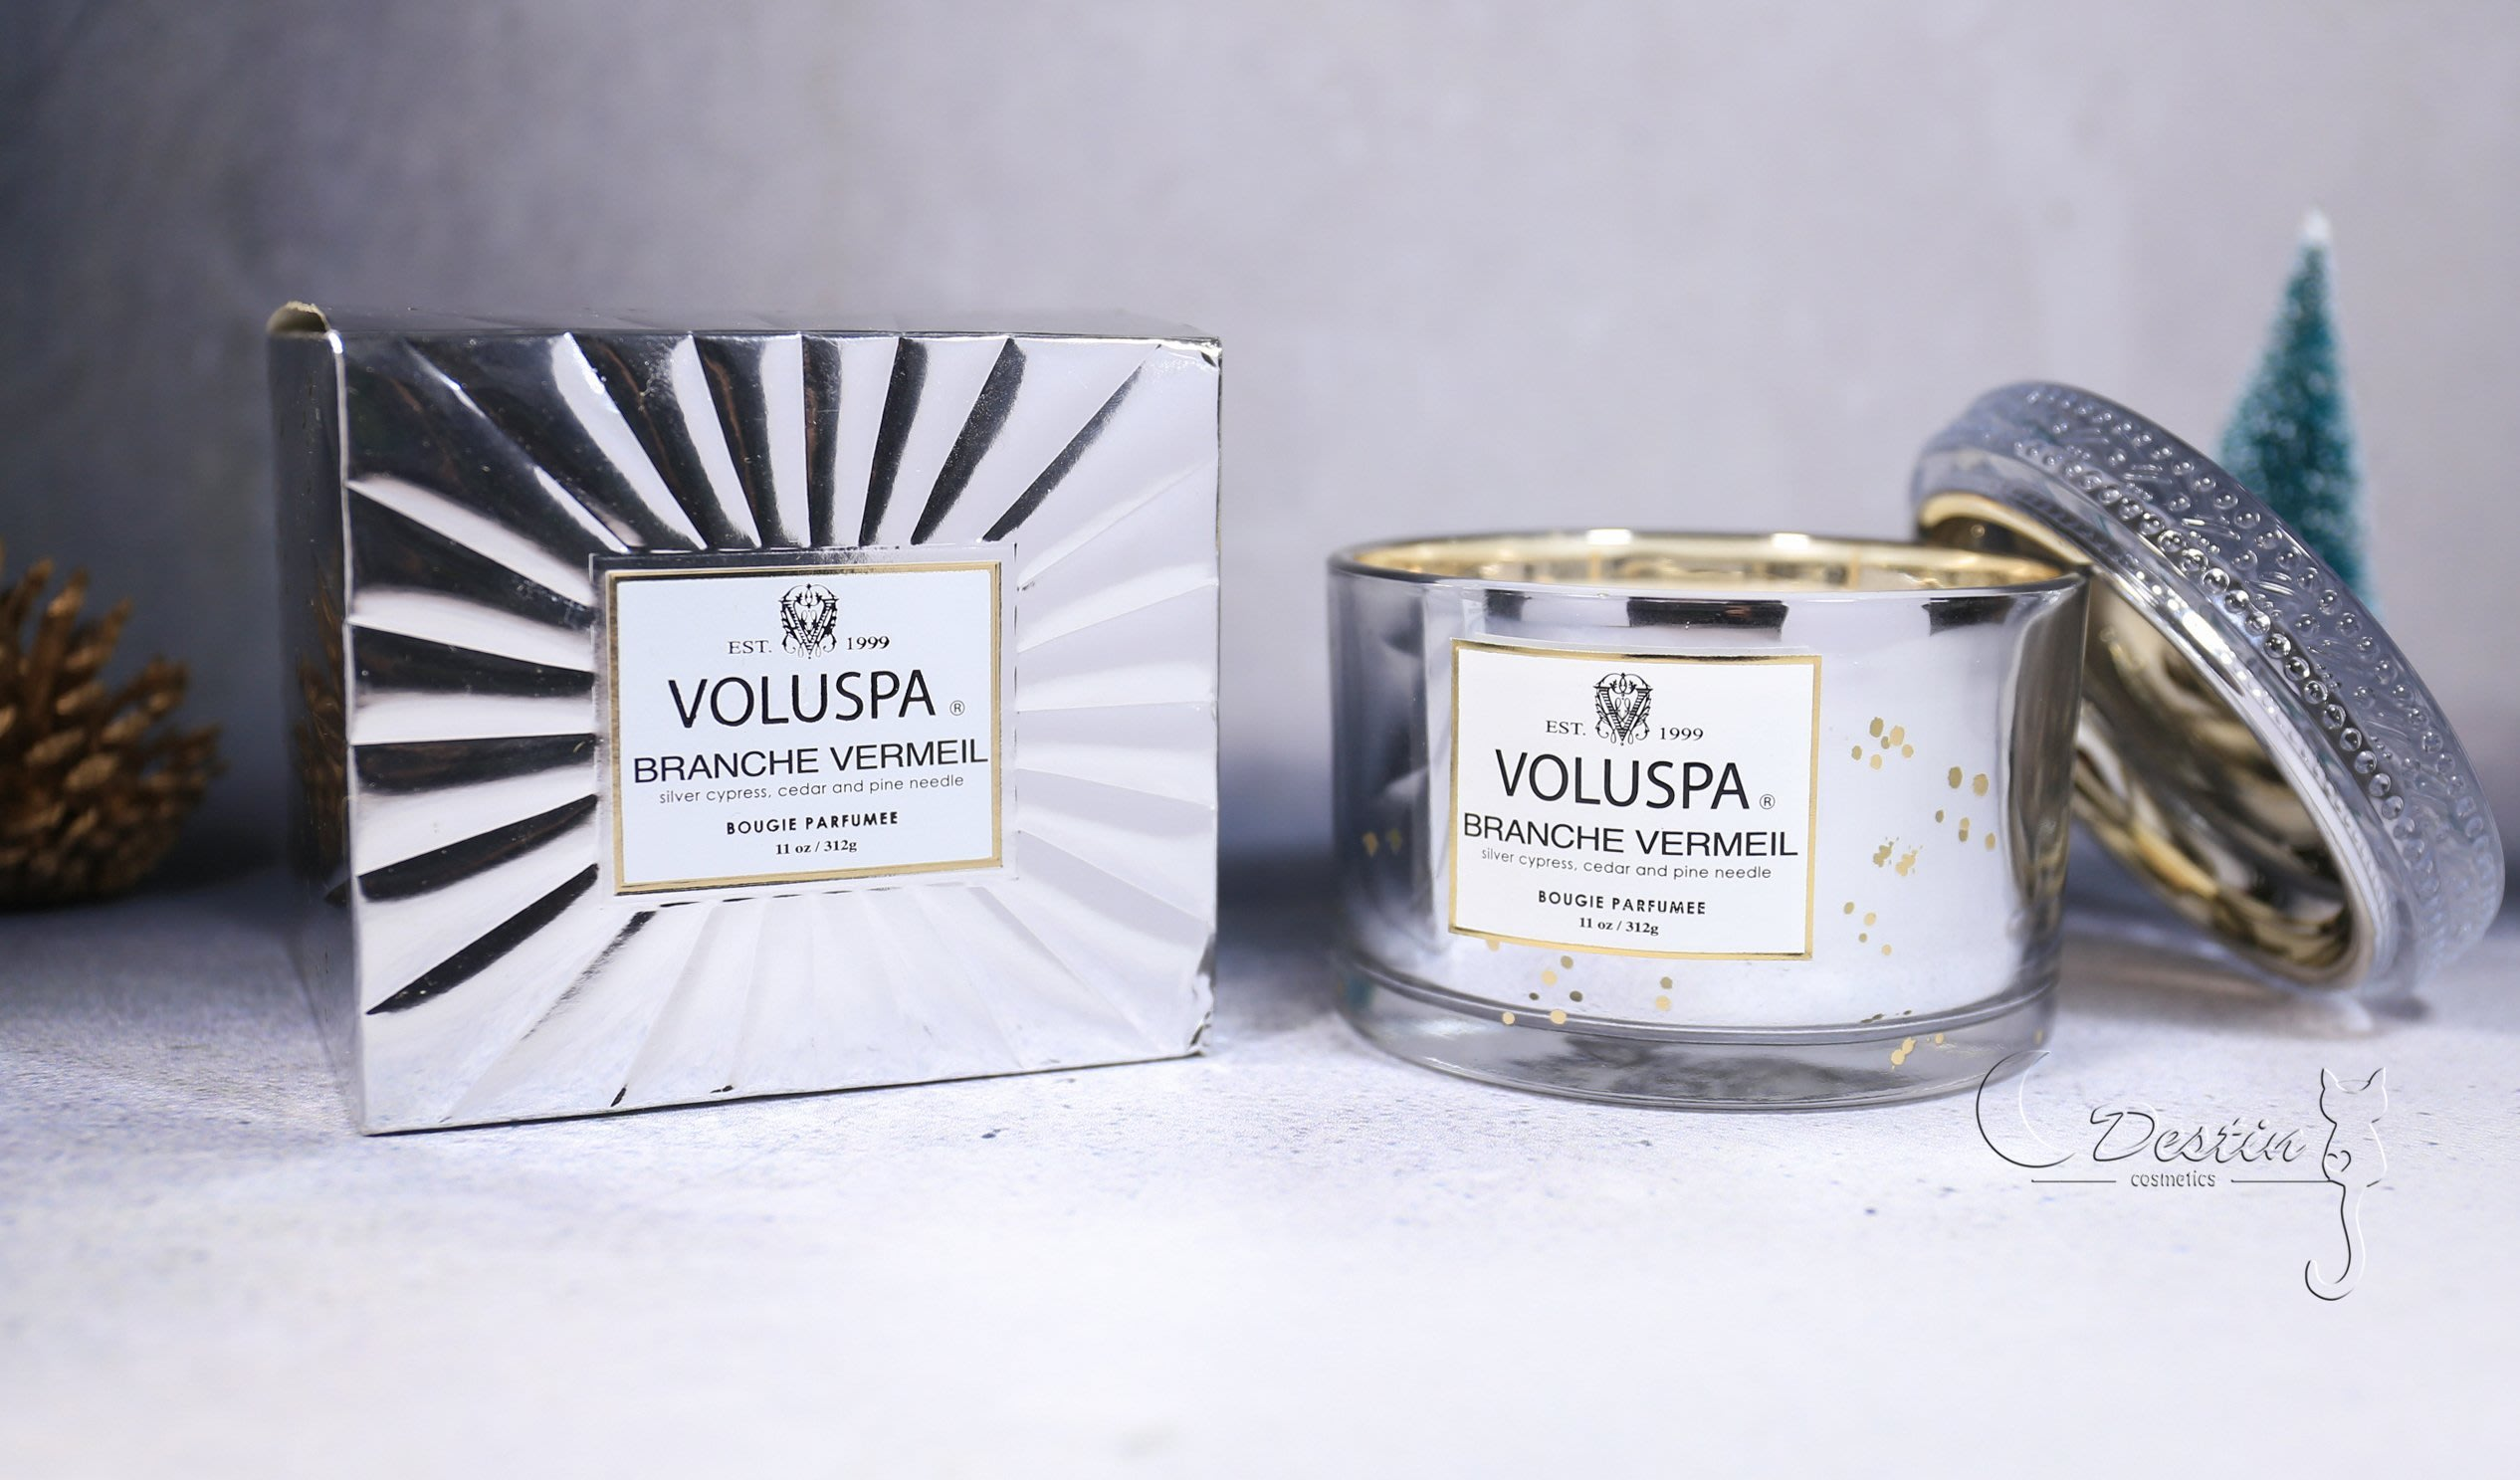 Voluspa 美國 香氛精油蠟燭 皇家森林 Branche Vermeil 11 oz 玻璃質感瓶身 全新 精美包裝